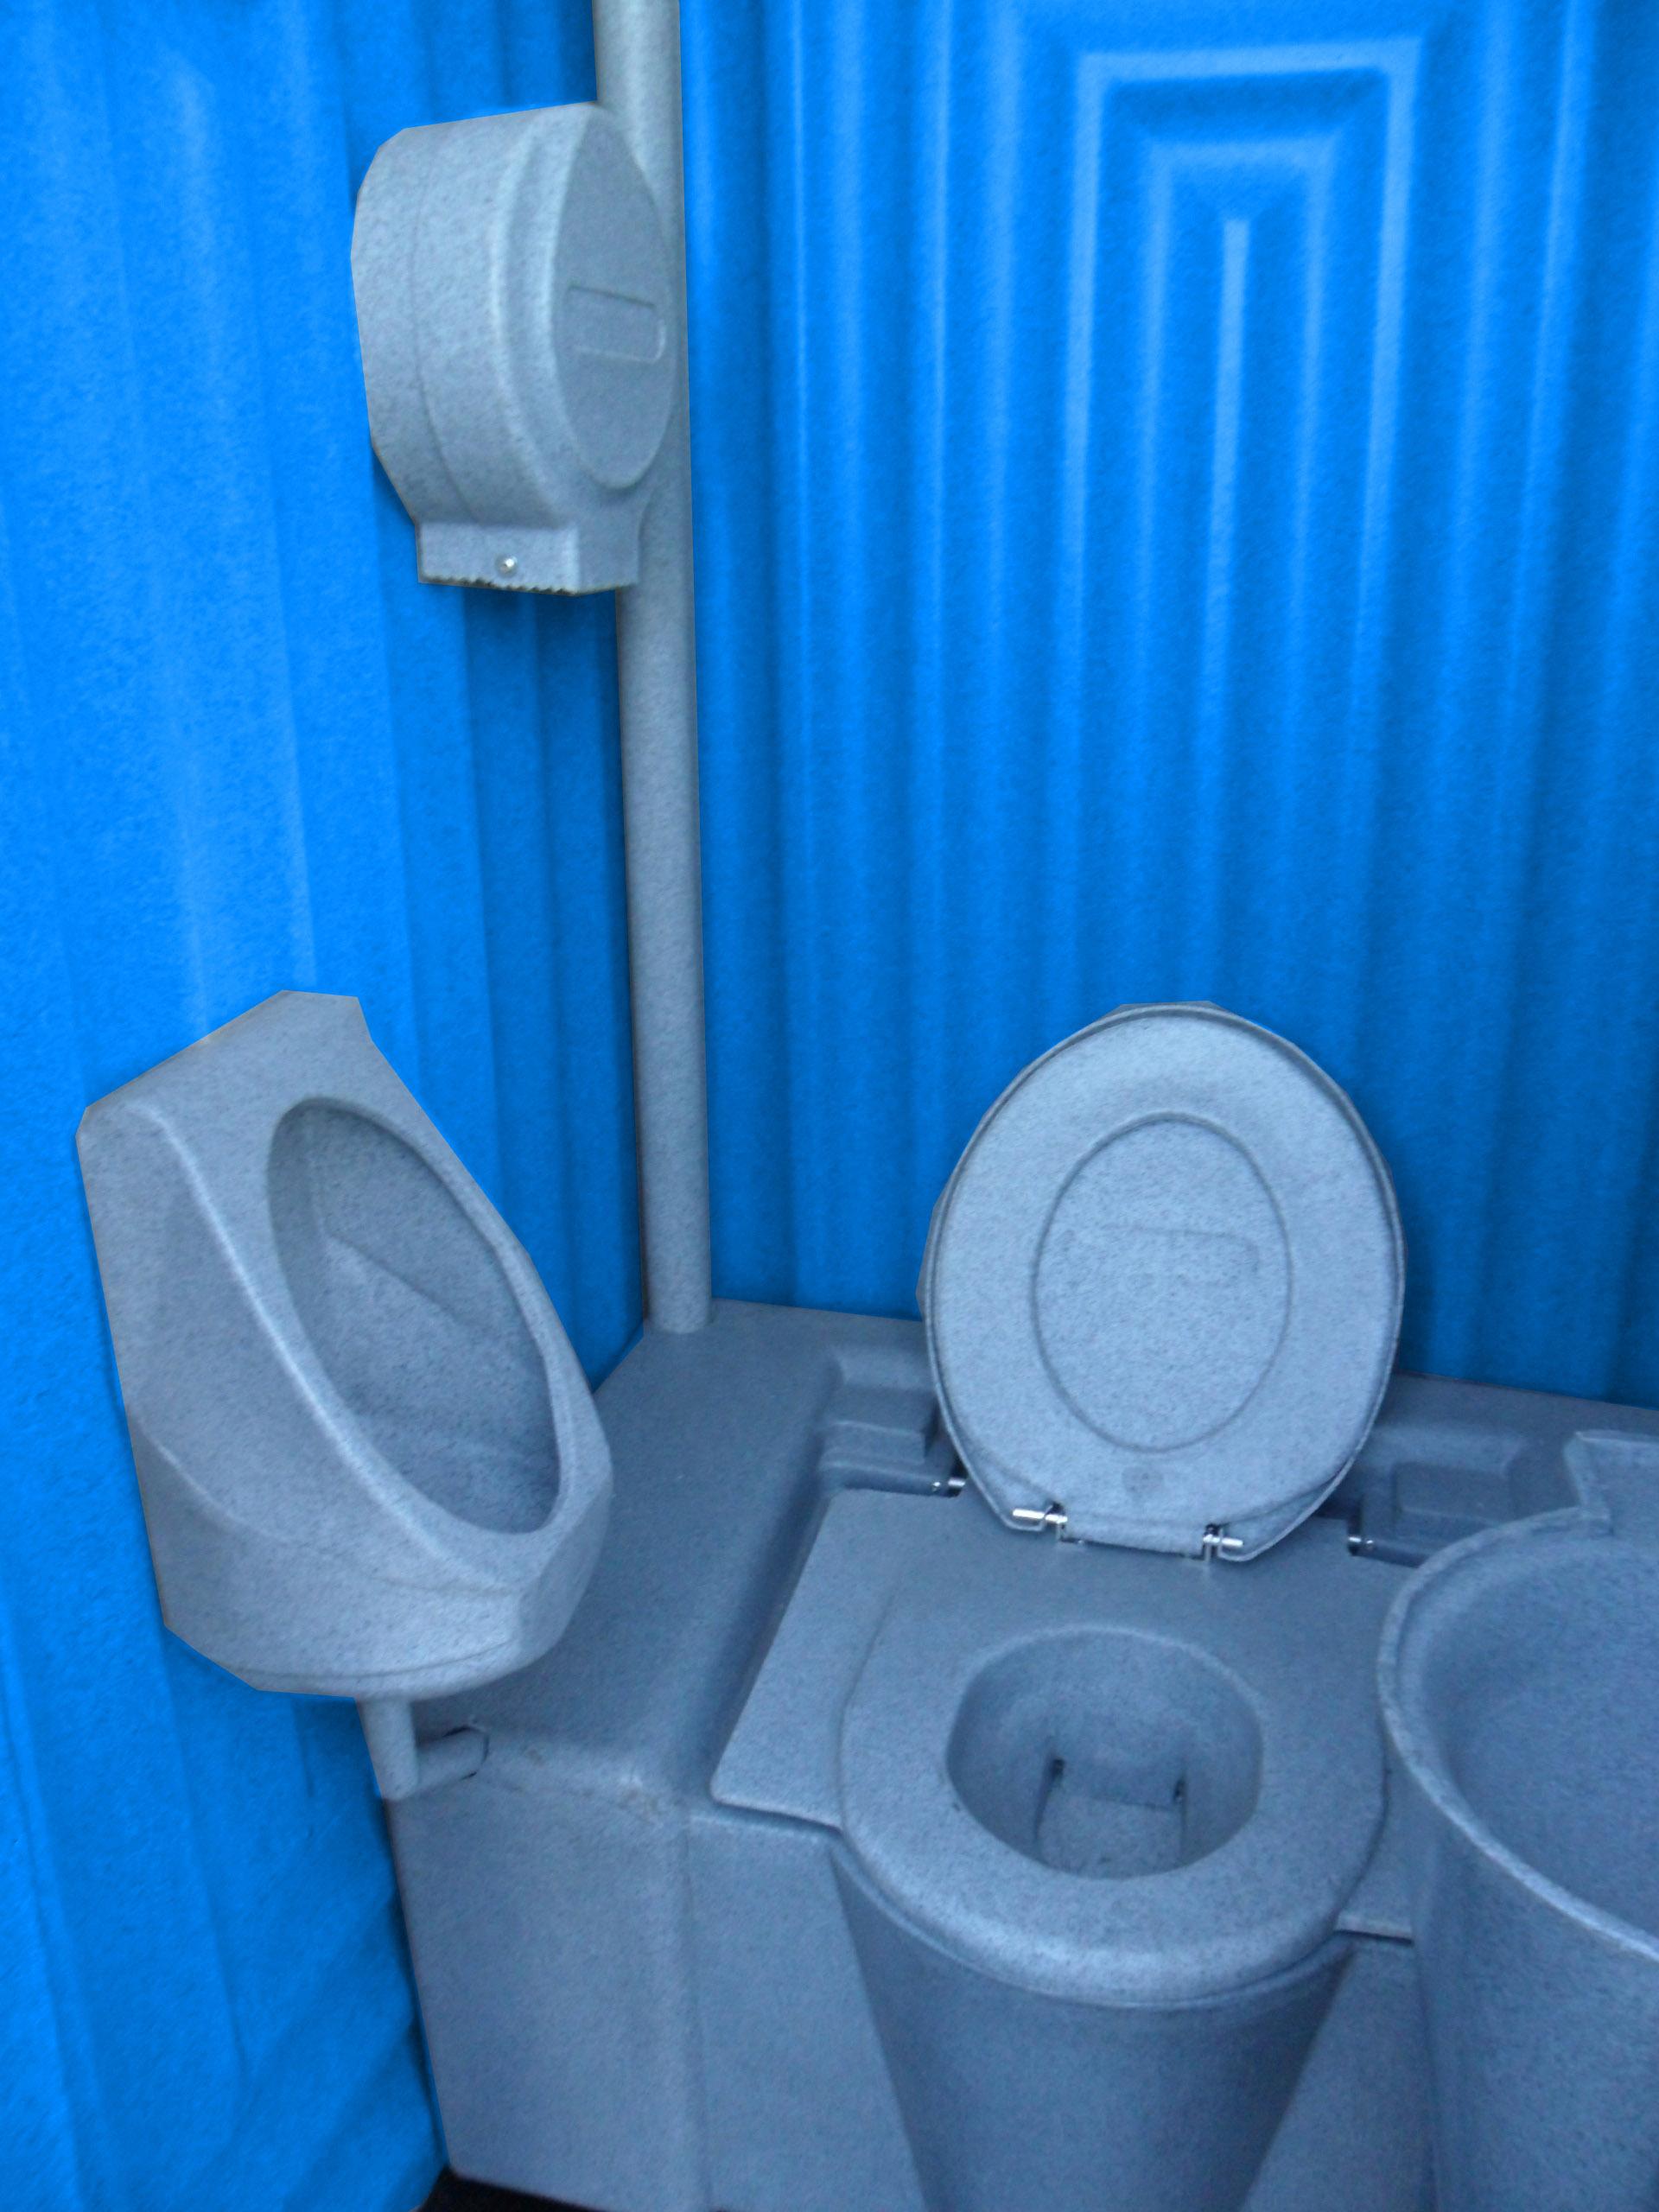 #016DCA Plastic Ambiental Indústria de Materiais Plásticos Ltda. 1920x2560 px Banheiro Ideal Ltda 3001